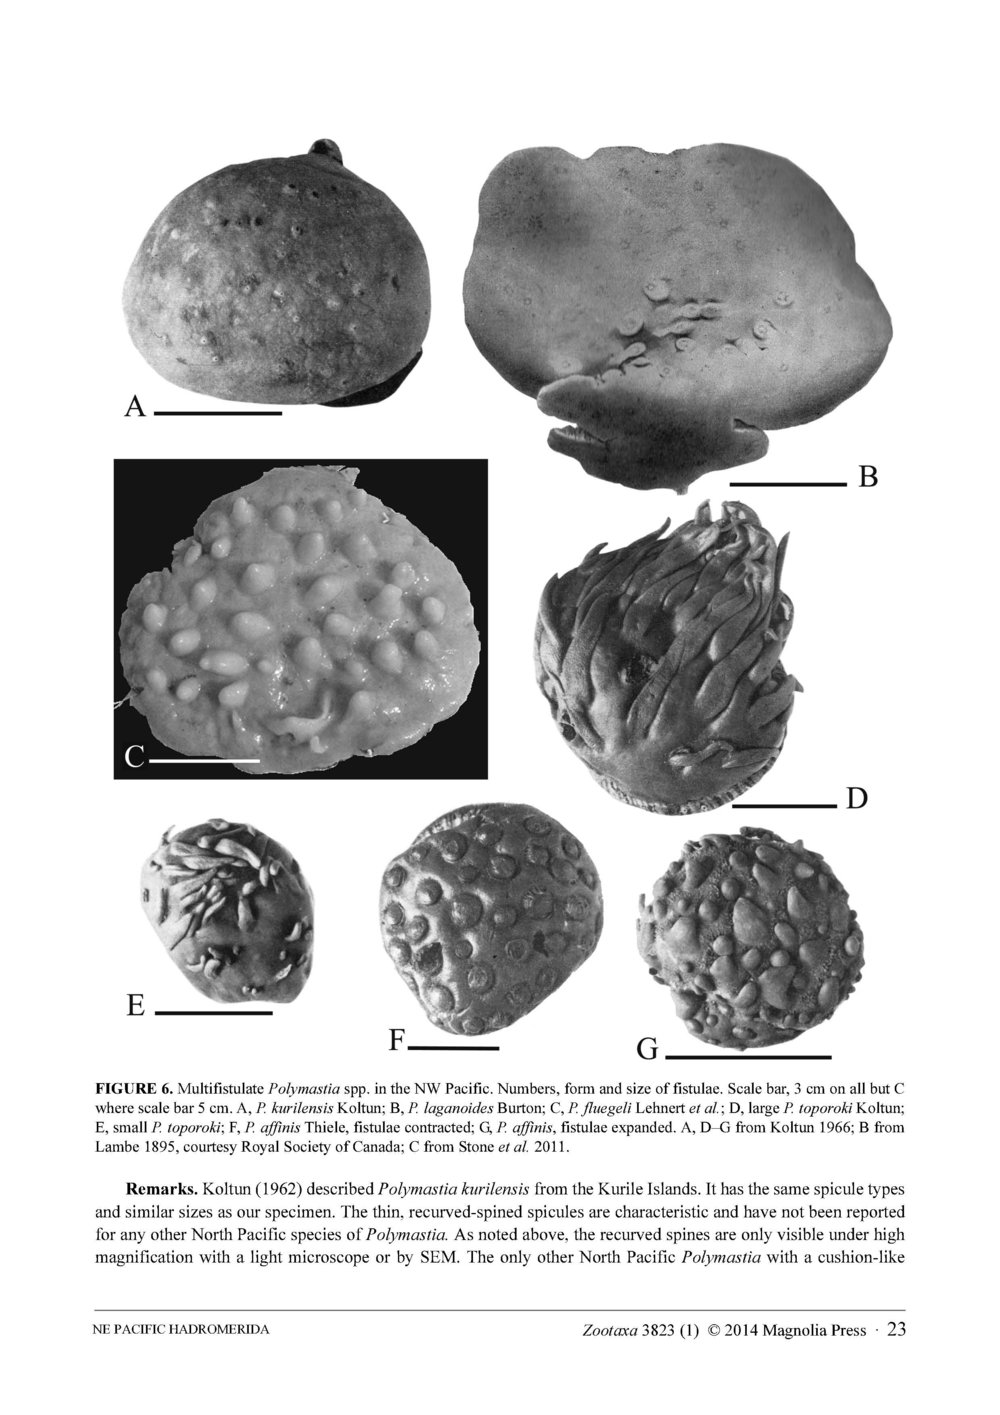 Austin et al 2014 NE Pacific Hadromerids_Page_23.jpg